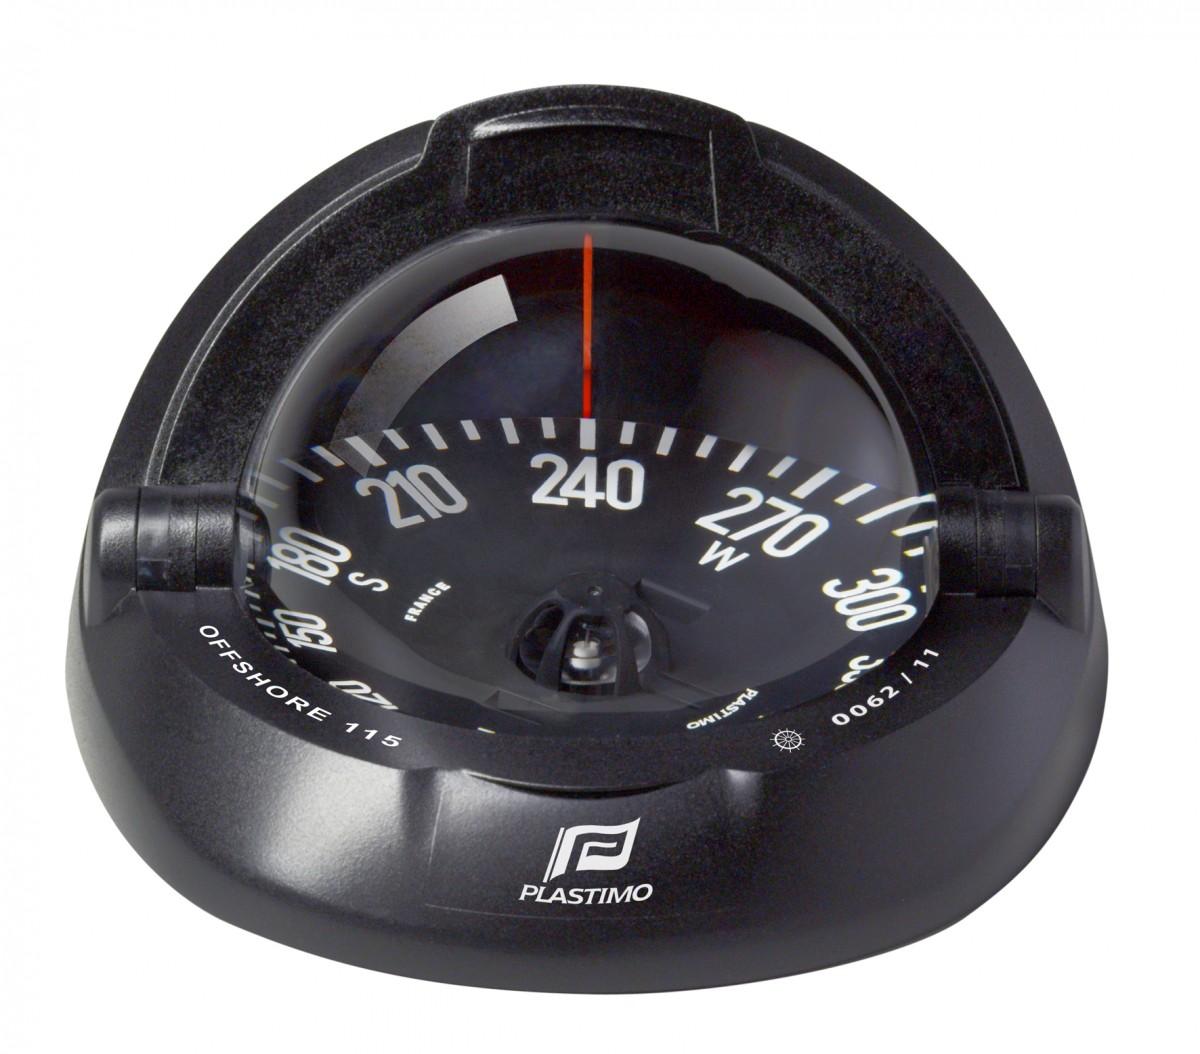 Plastimo Kompass Offshore 115